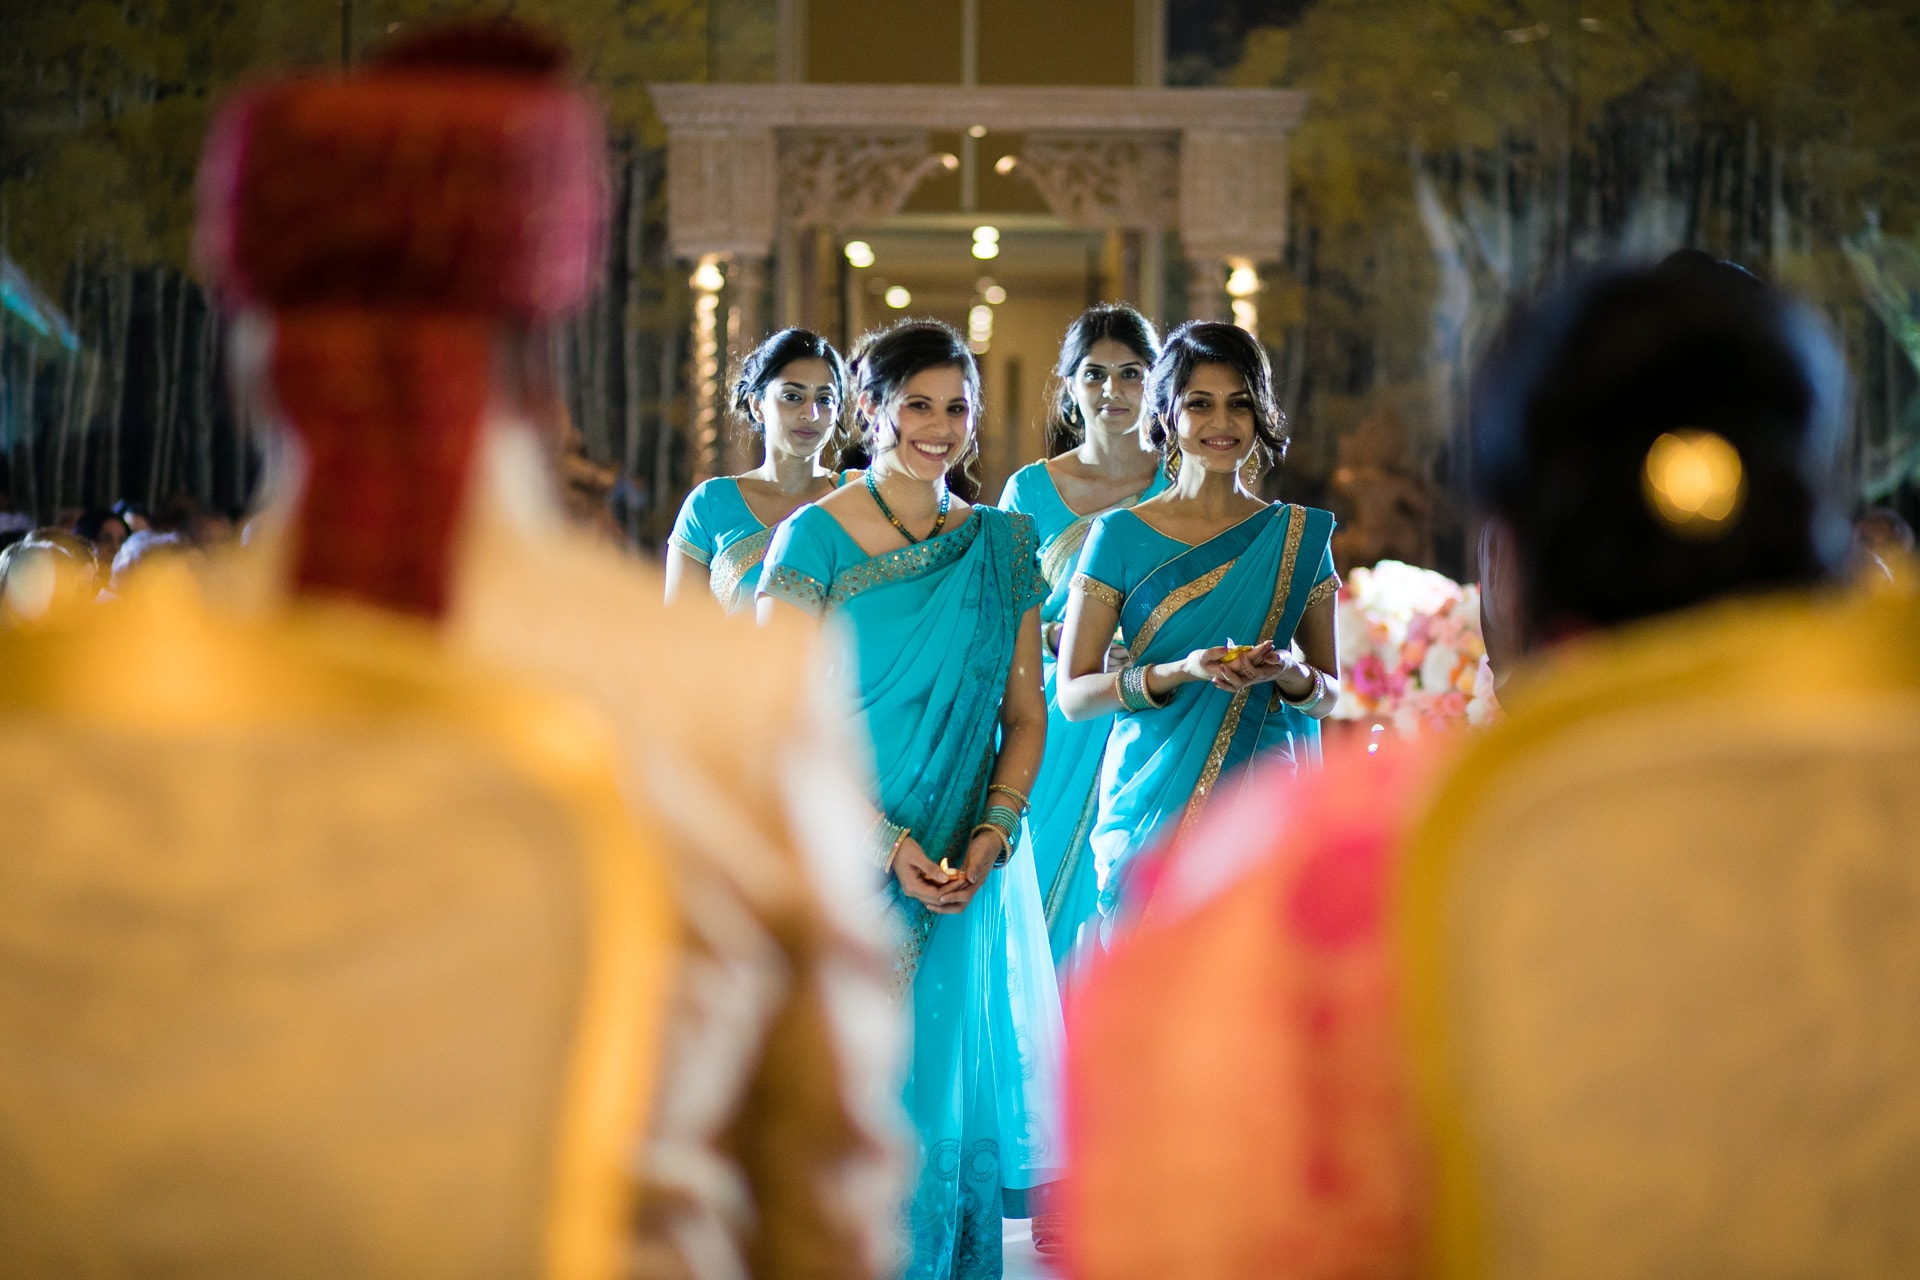 Bridal entrance party